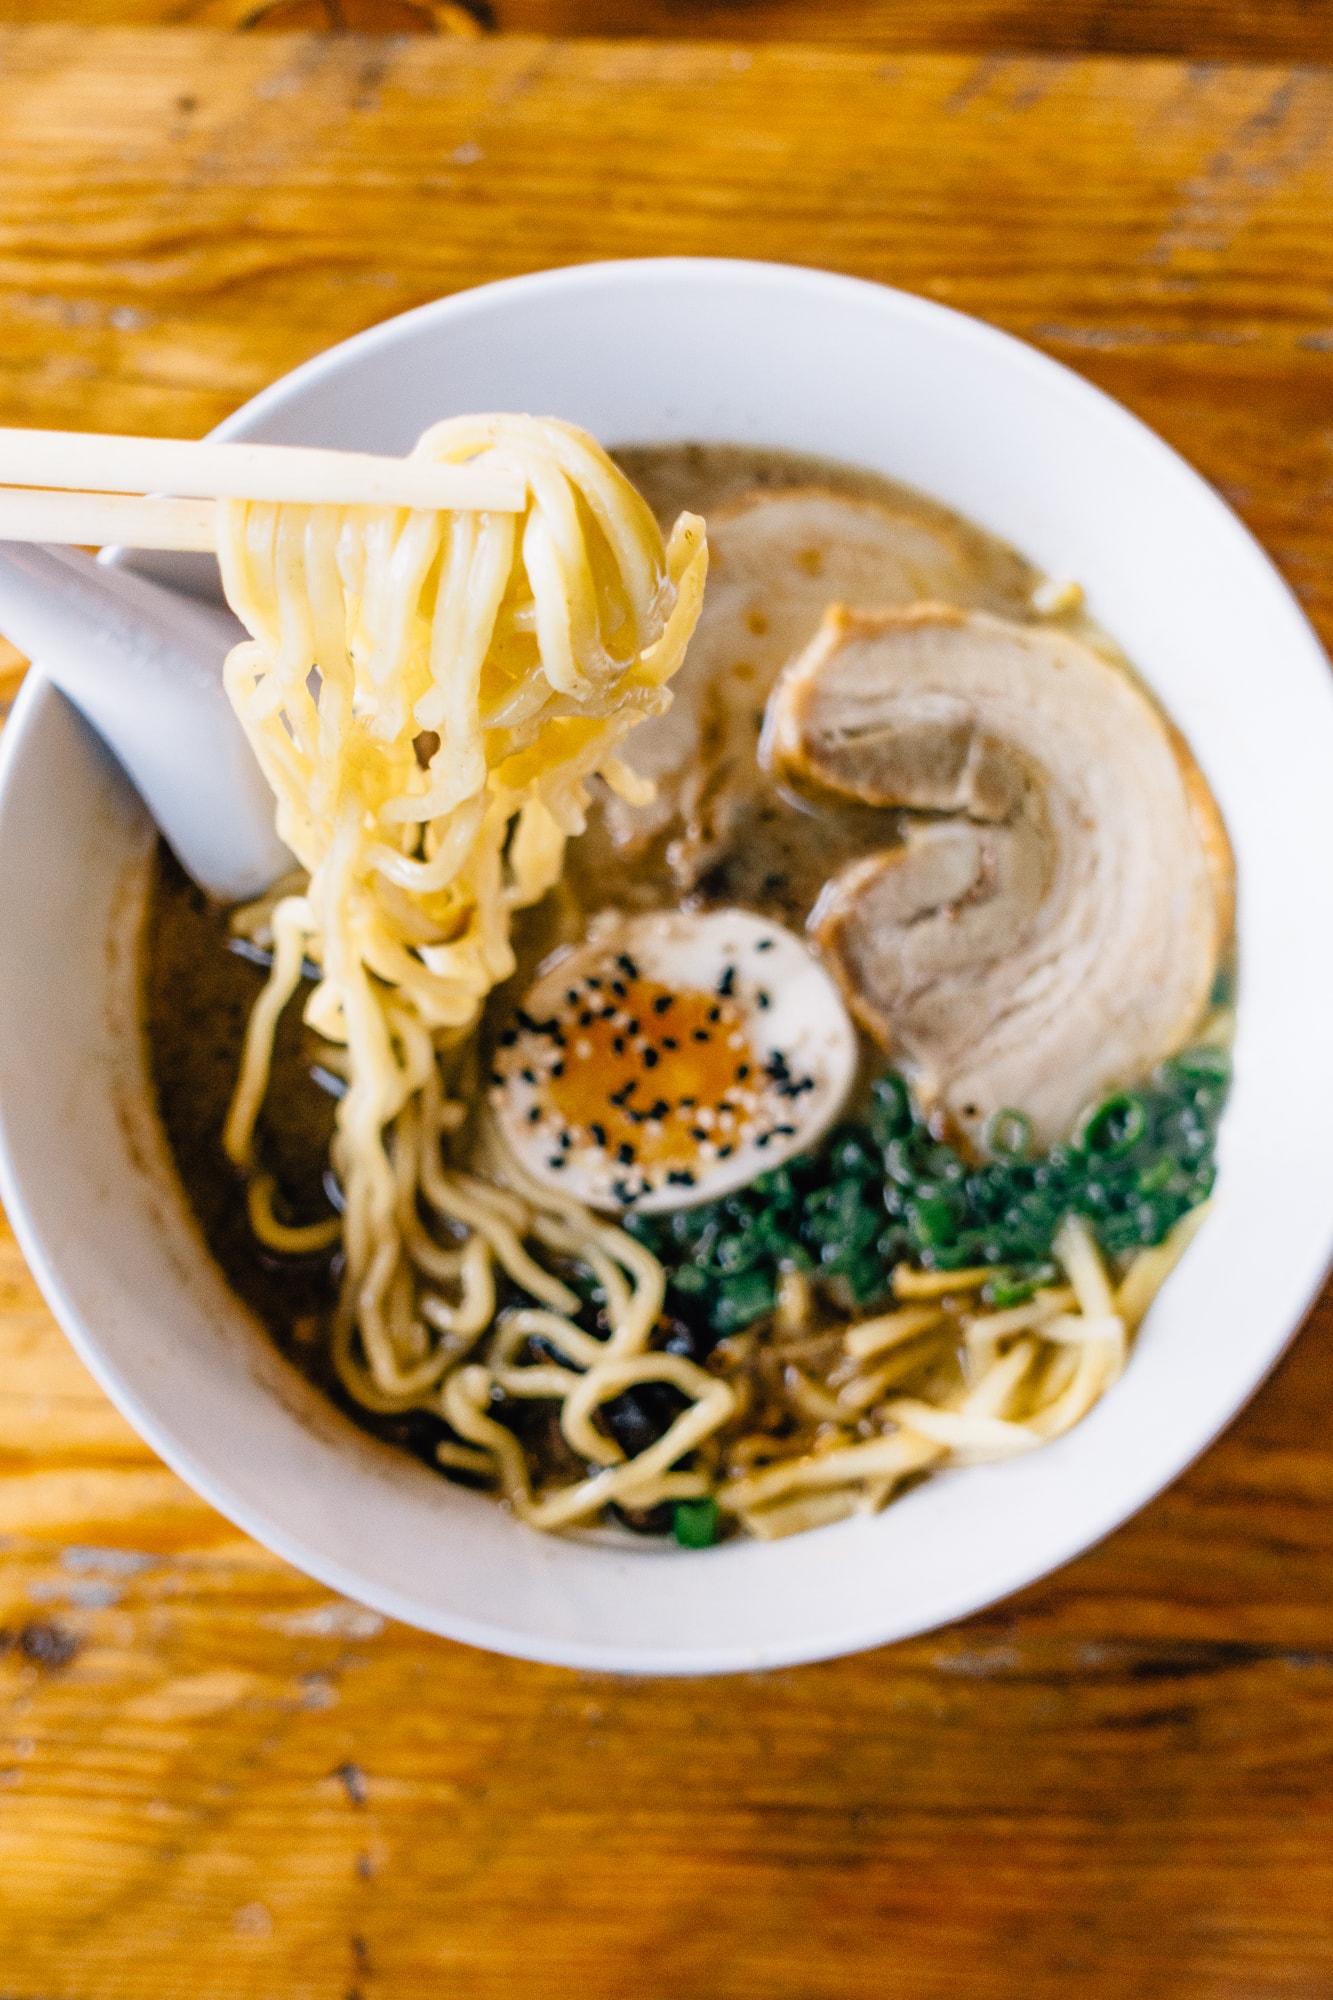 Ace Eat Serve: Super Cheap Happy Hour Ramen | New Denizen